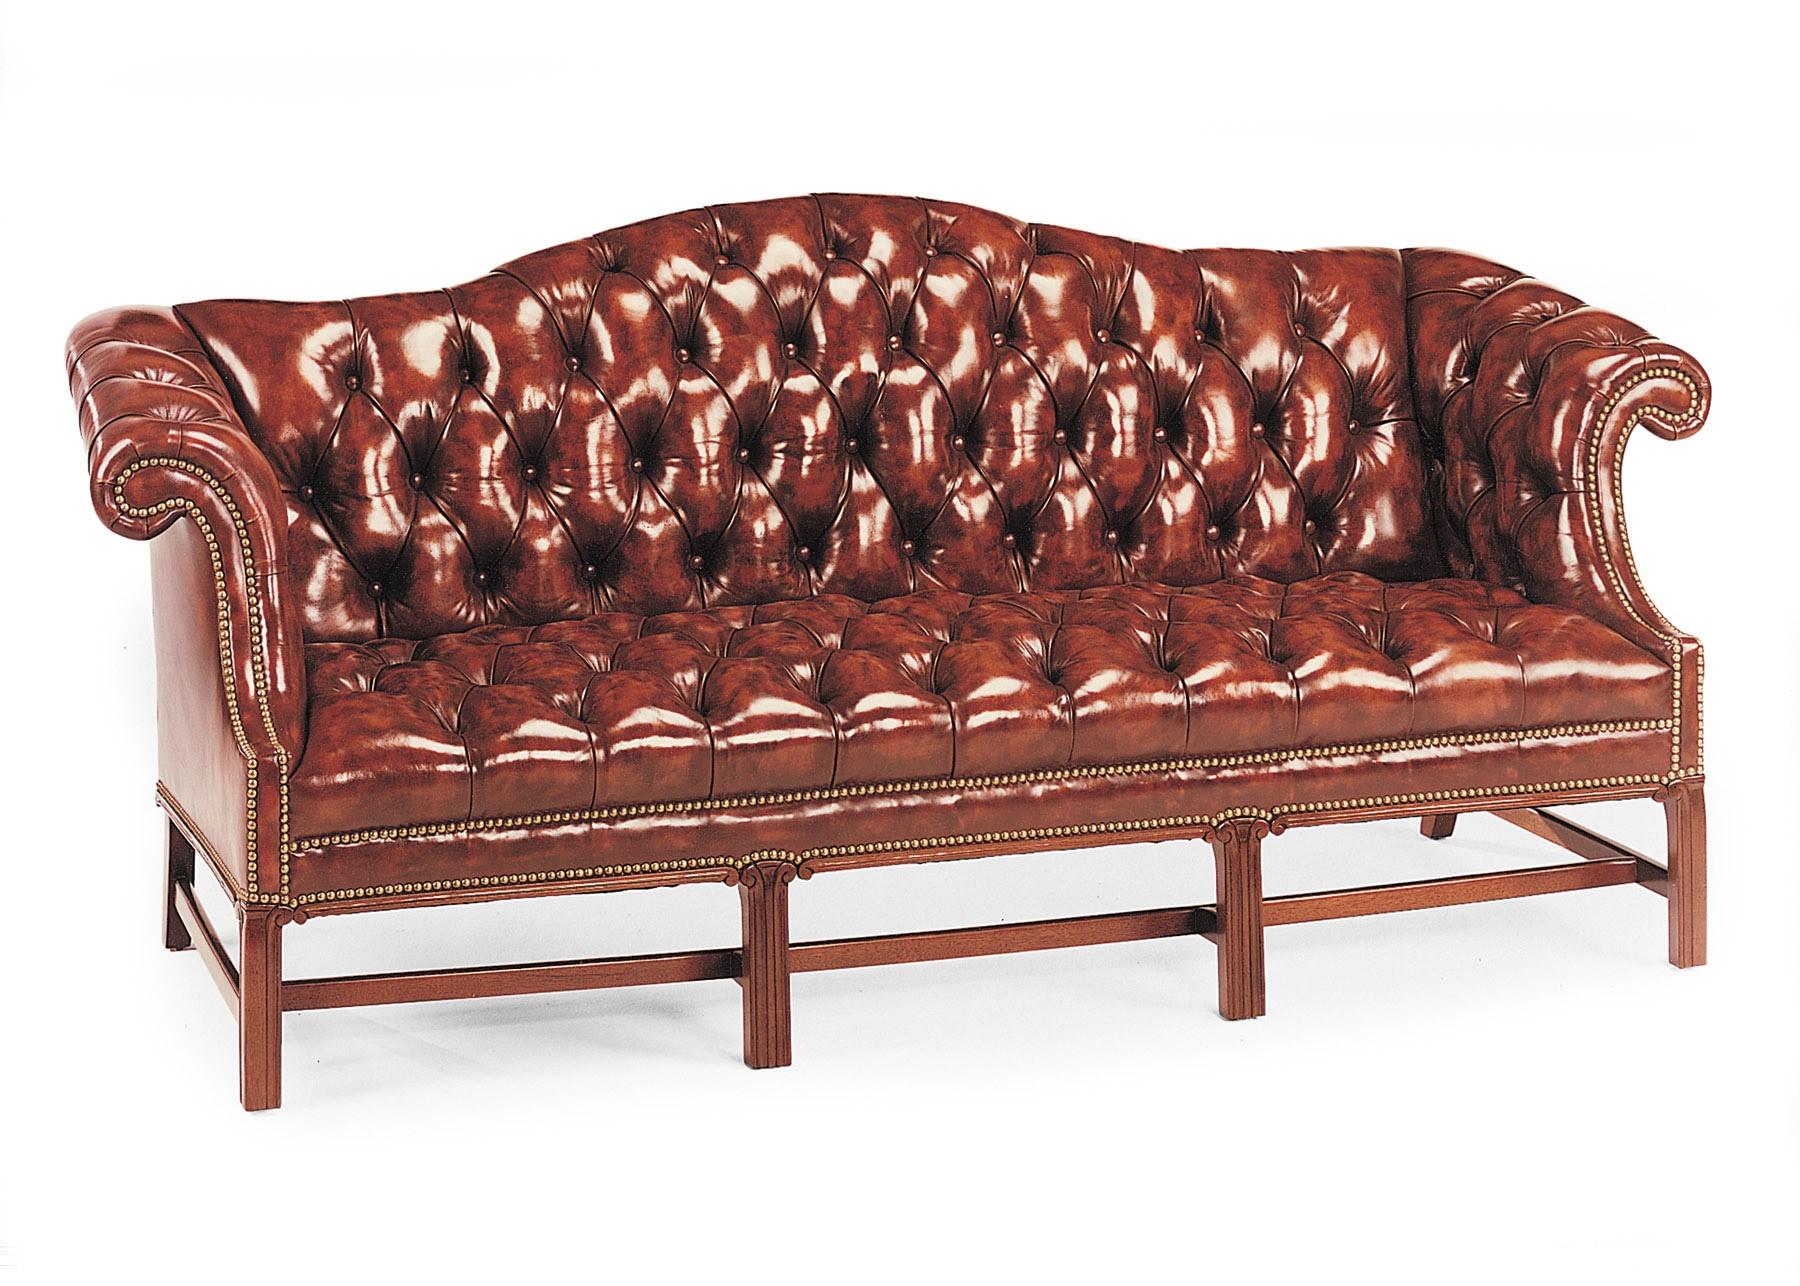 camel tufted sofa chaise de 300 00 cabot wrenn cw2863 camelback three seater